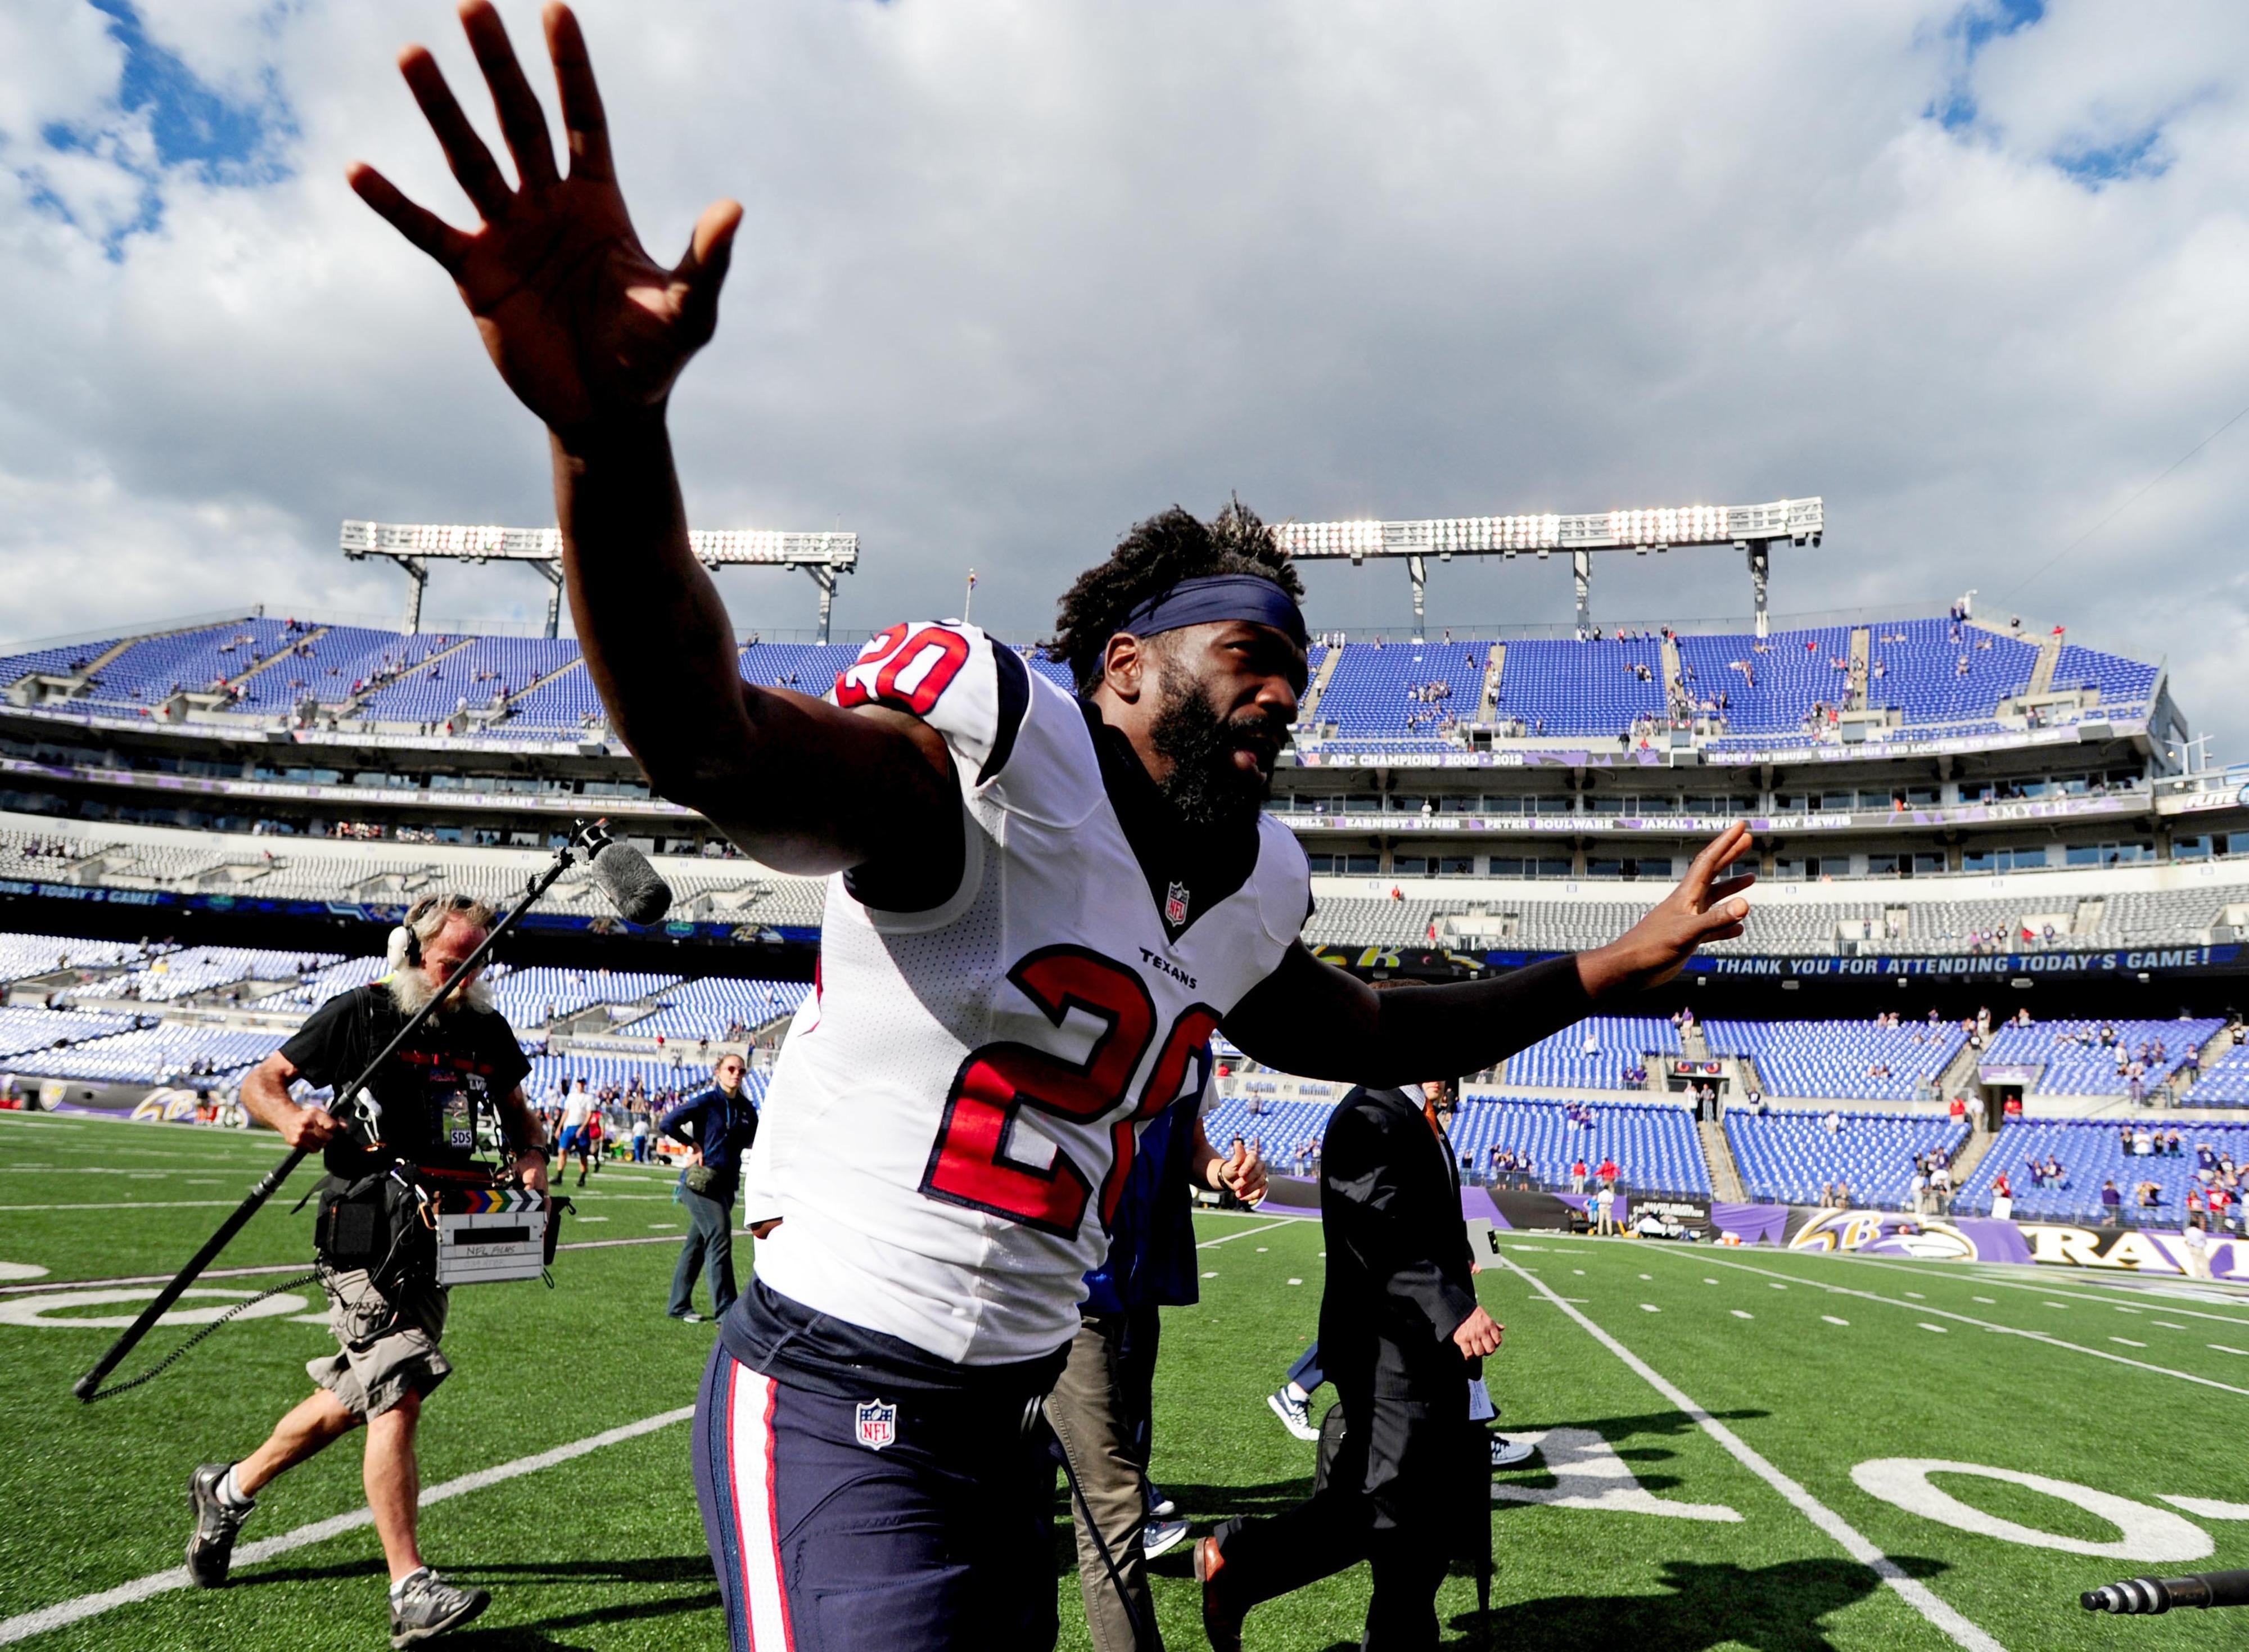 At least one Texan enjoyed himself on Sunday.